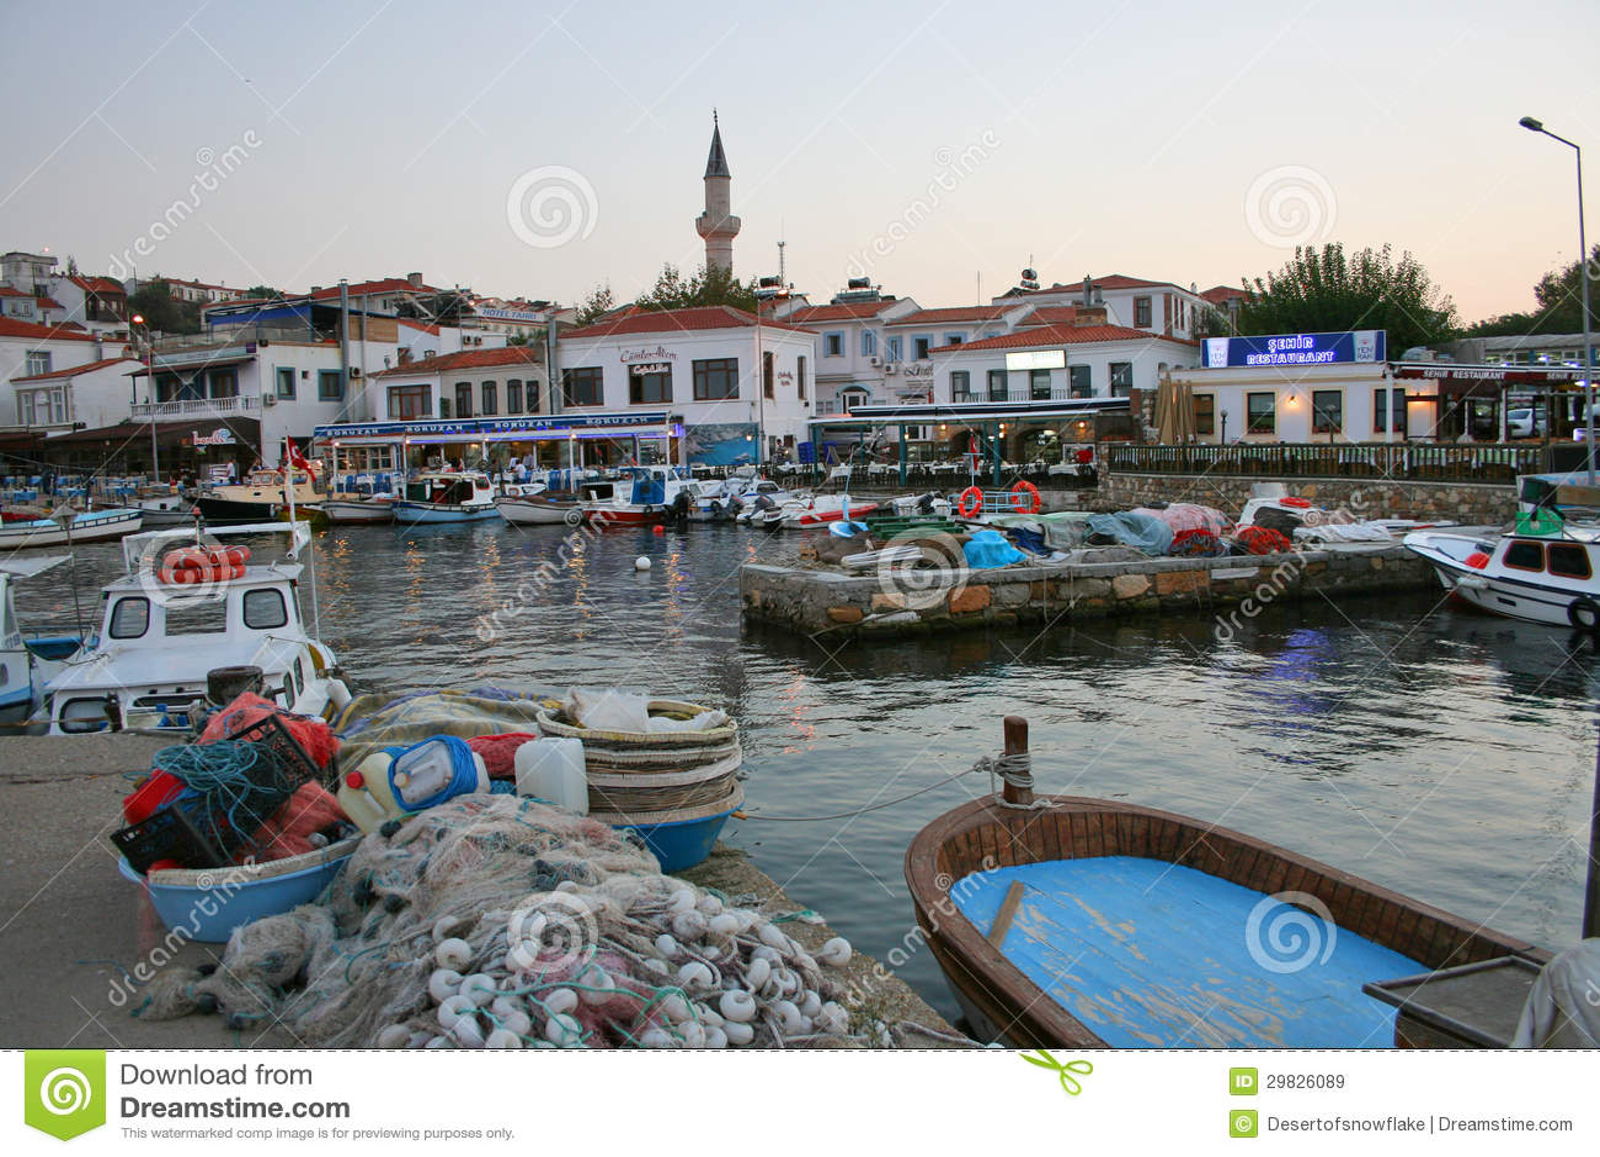 Port Of Bozcaada Editorial Stock Image - Image: 29826089